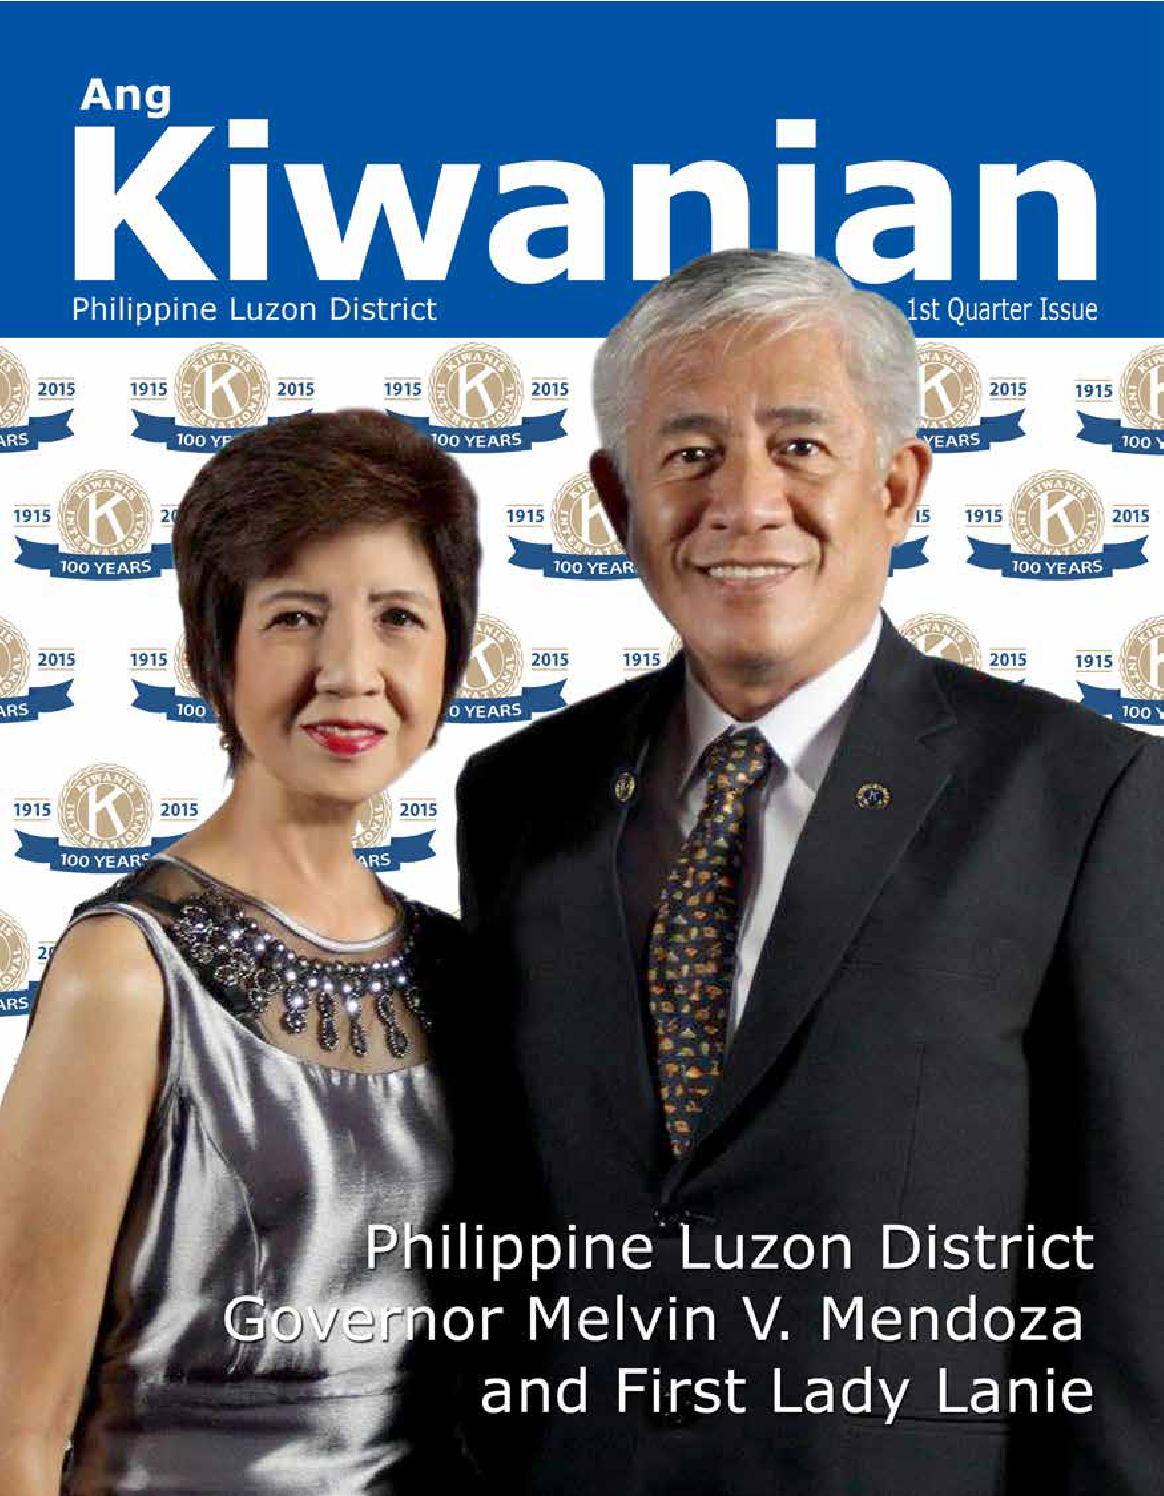 Ang kiwanian First Issue